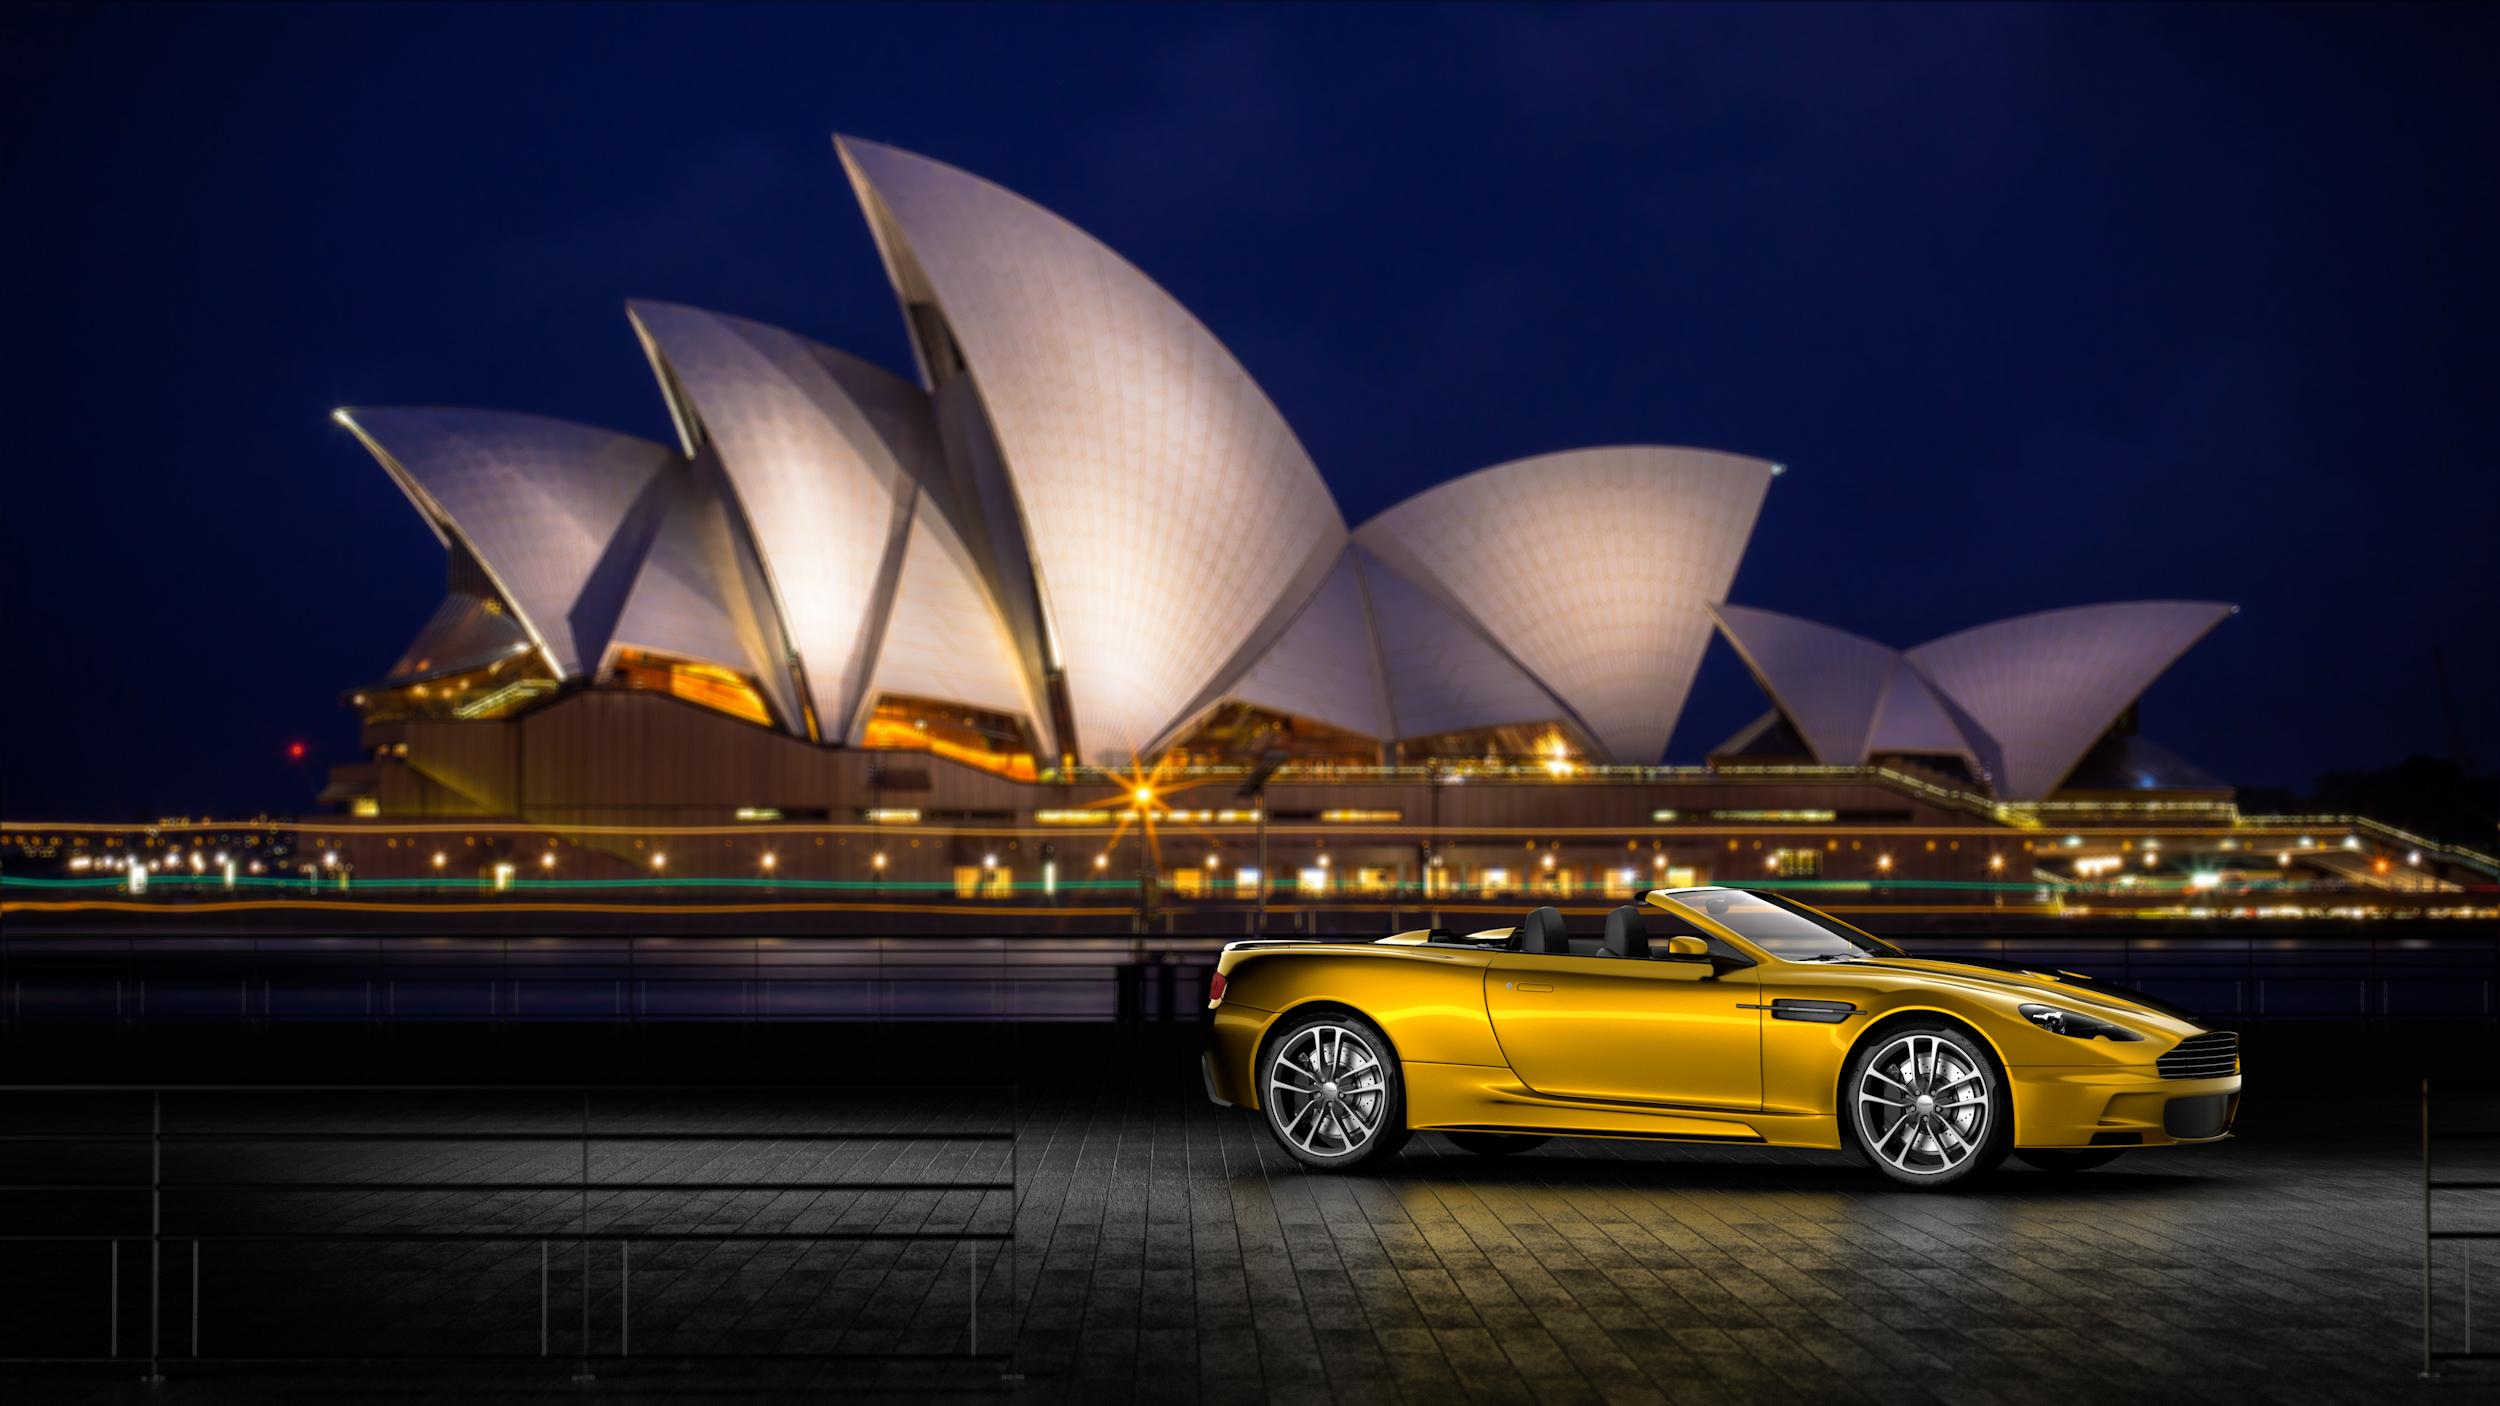 Aston Martin Volante 90mm Modo 13.0v1 v35 W DOF F2.8 Yellow 9h26m 78.74%.jpg